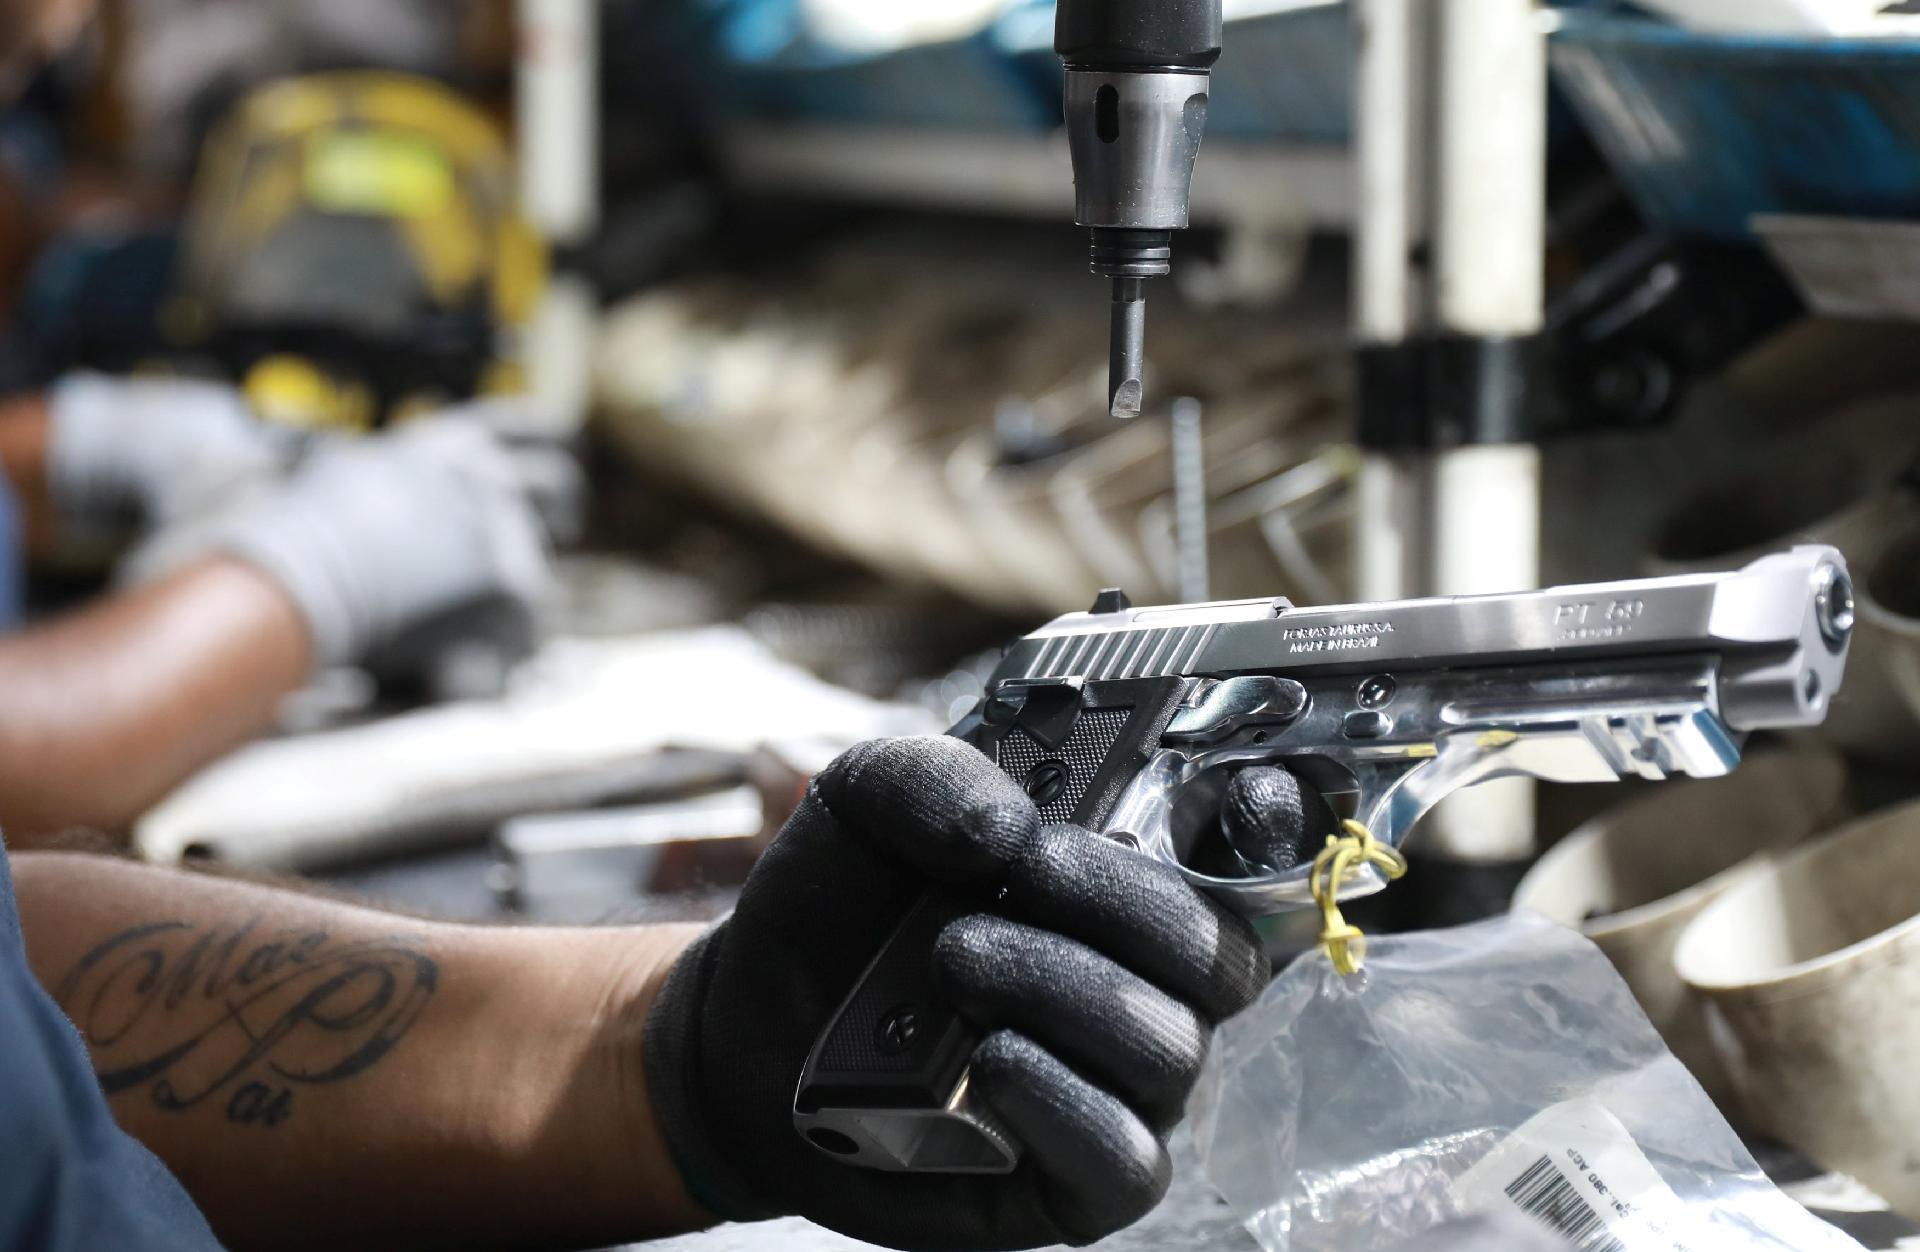 Taurus gun production unit in Brazil